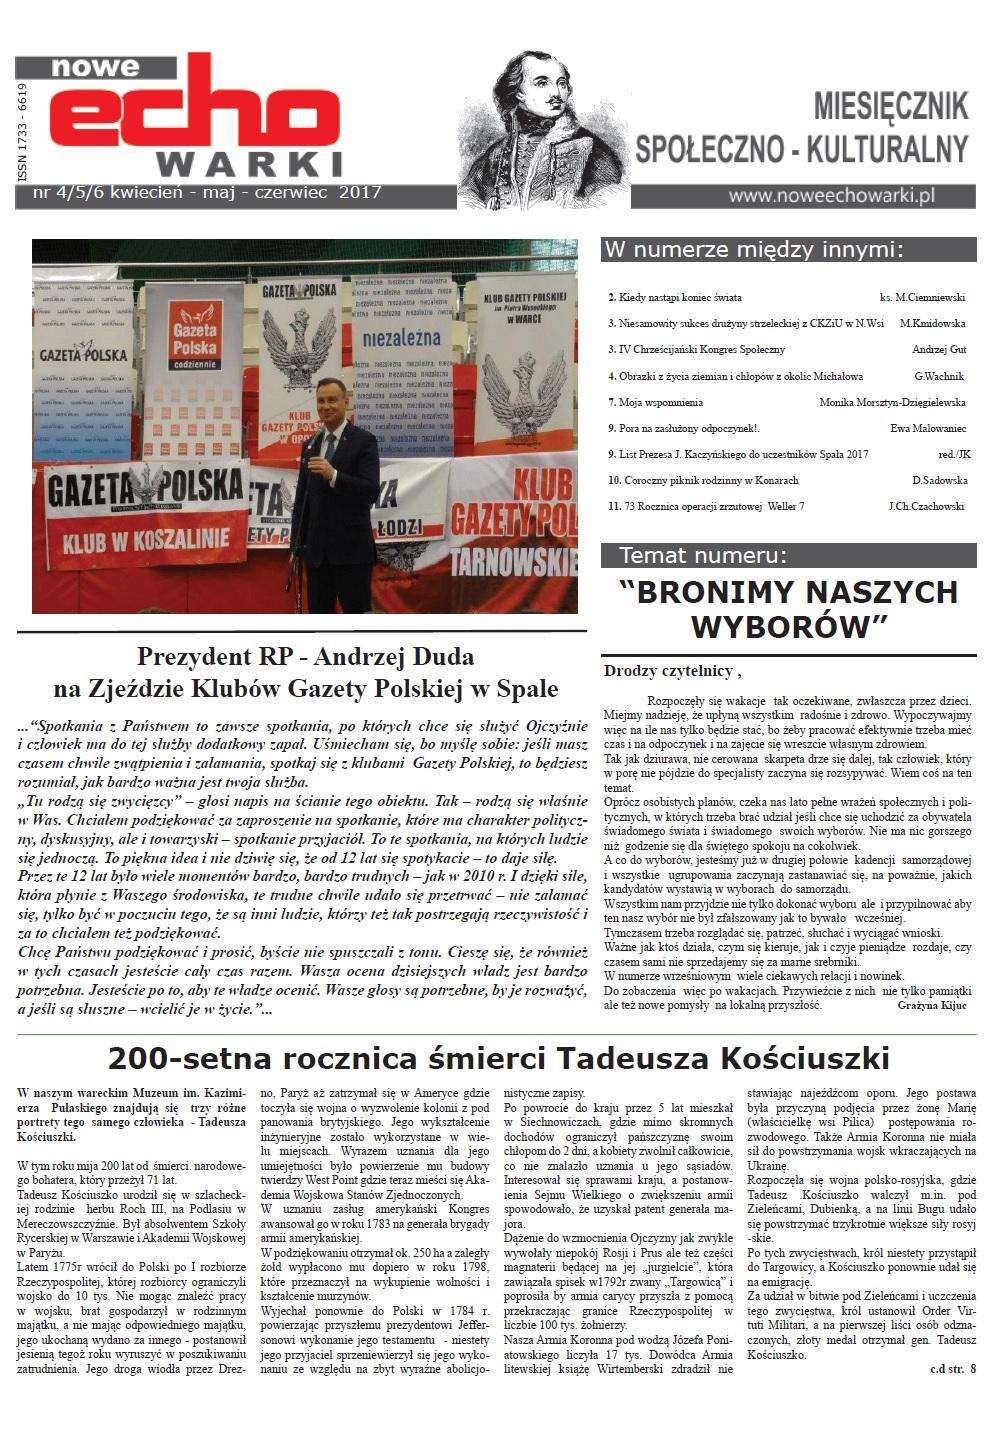 Warka - Zjazd 2017a